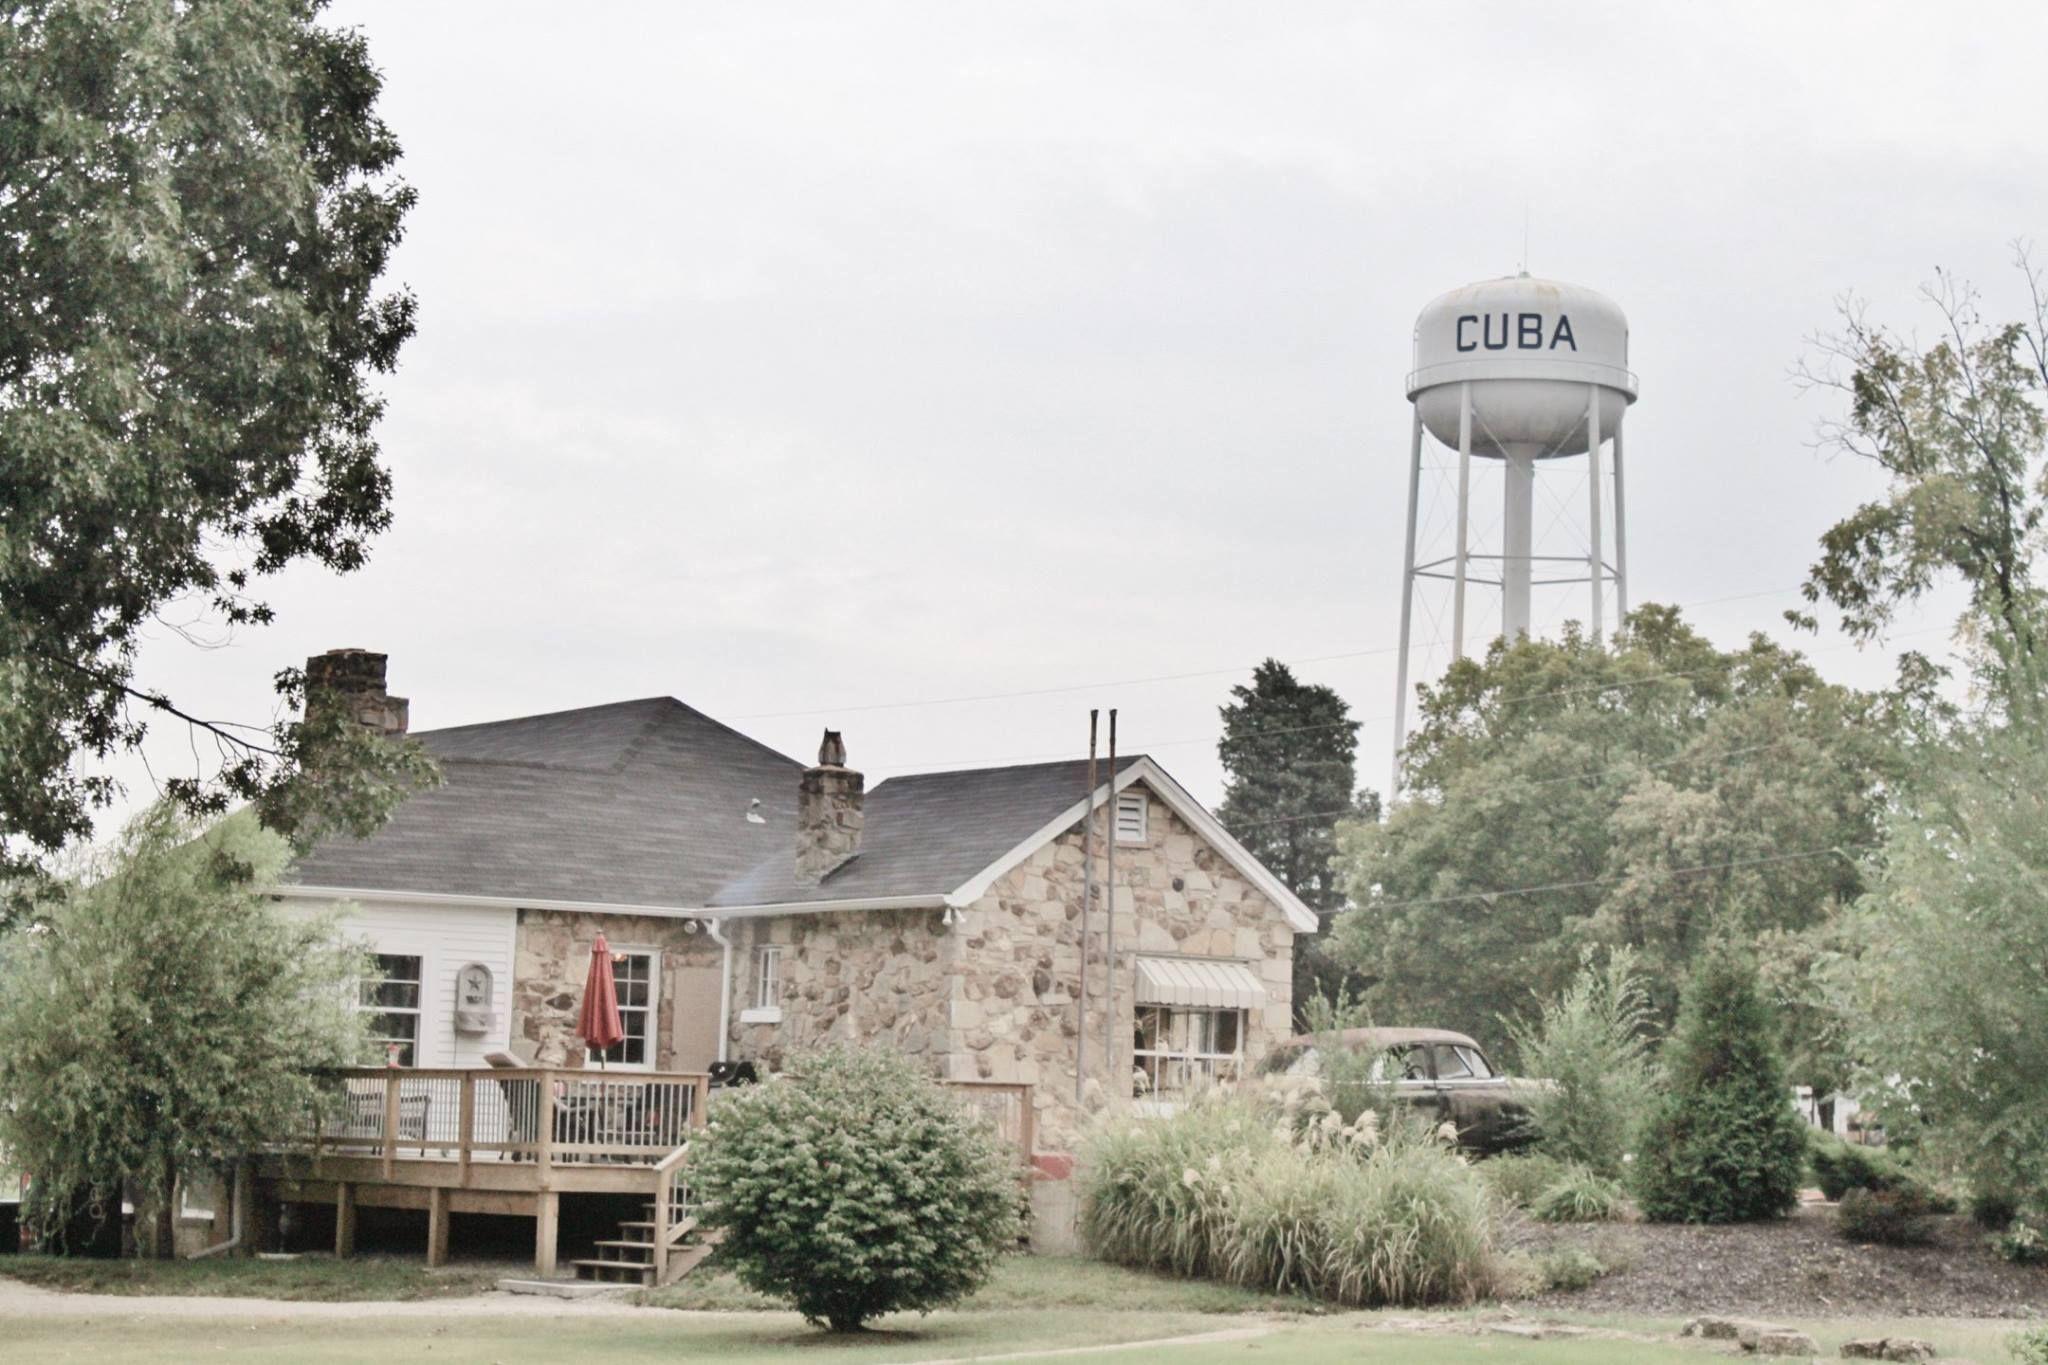 Historic Wagon Wheel Motel featuring Connie's Shoppe